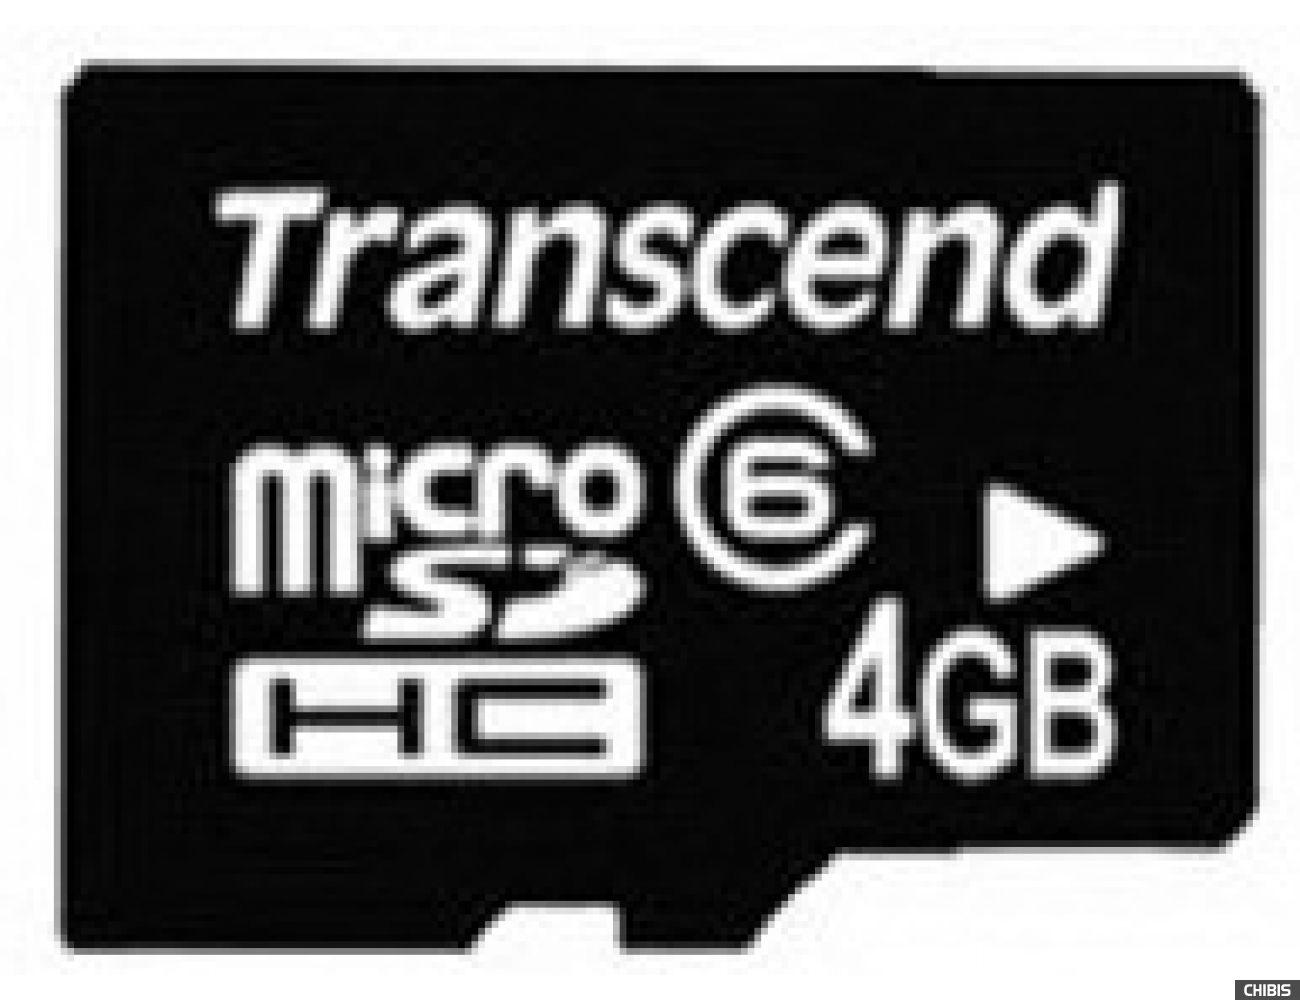 Карта памяти Transcend MicroSDHC 4Gb (Class 6) no adapter